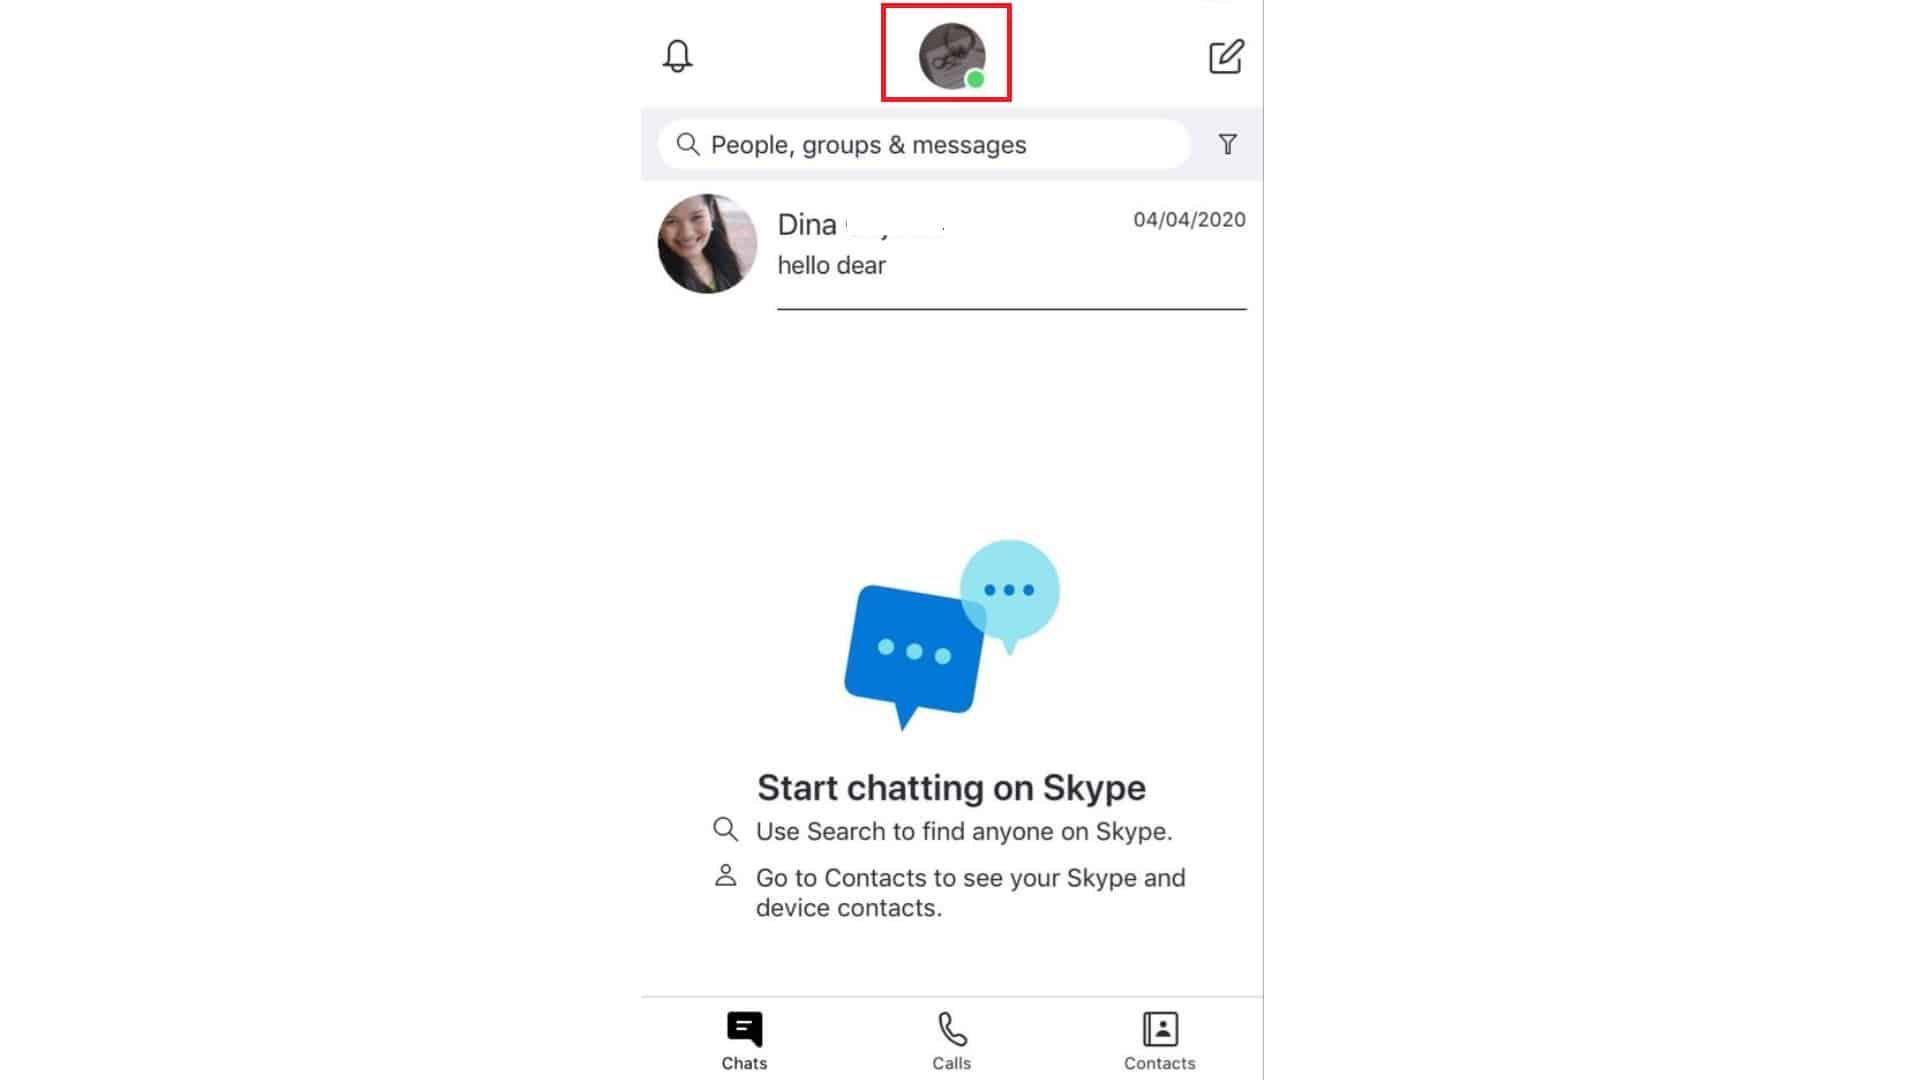 Change-Language-on-Skype-2020